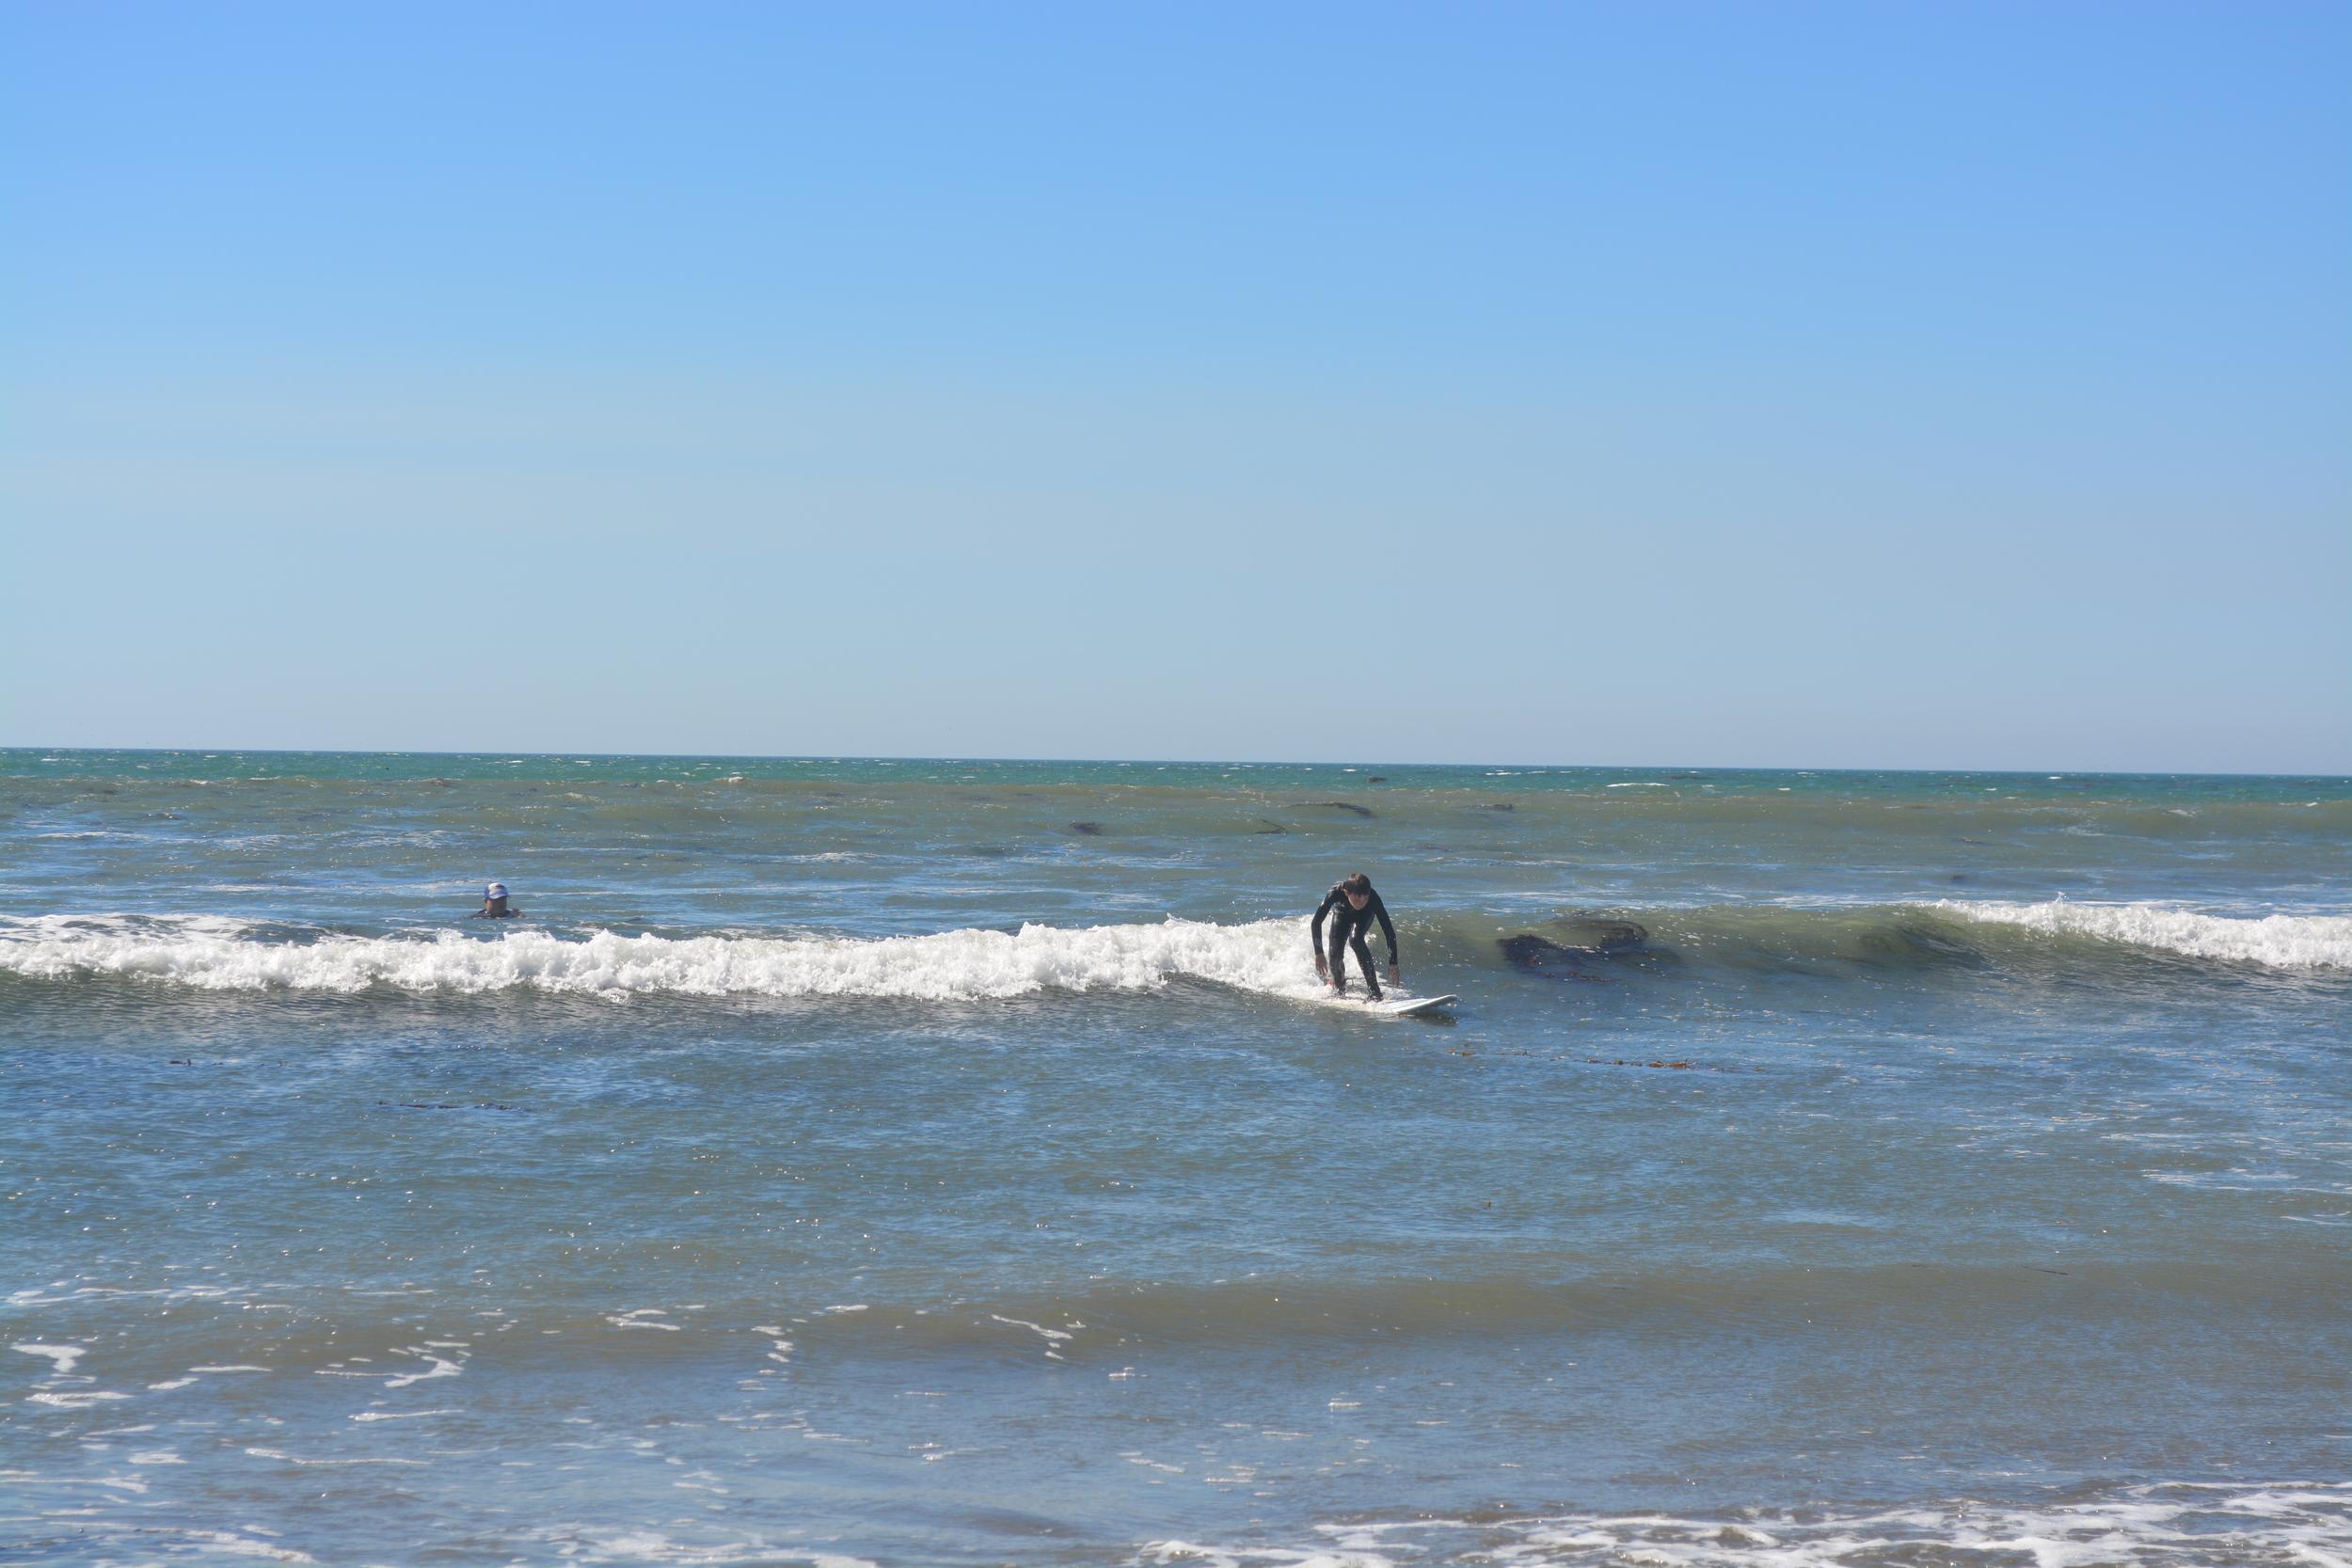 Baja California 10-5-13 Shipwrecks Surfing Adventure Ocean Experience Surf School San Diego (12).JPG